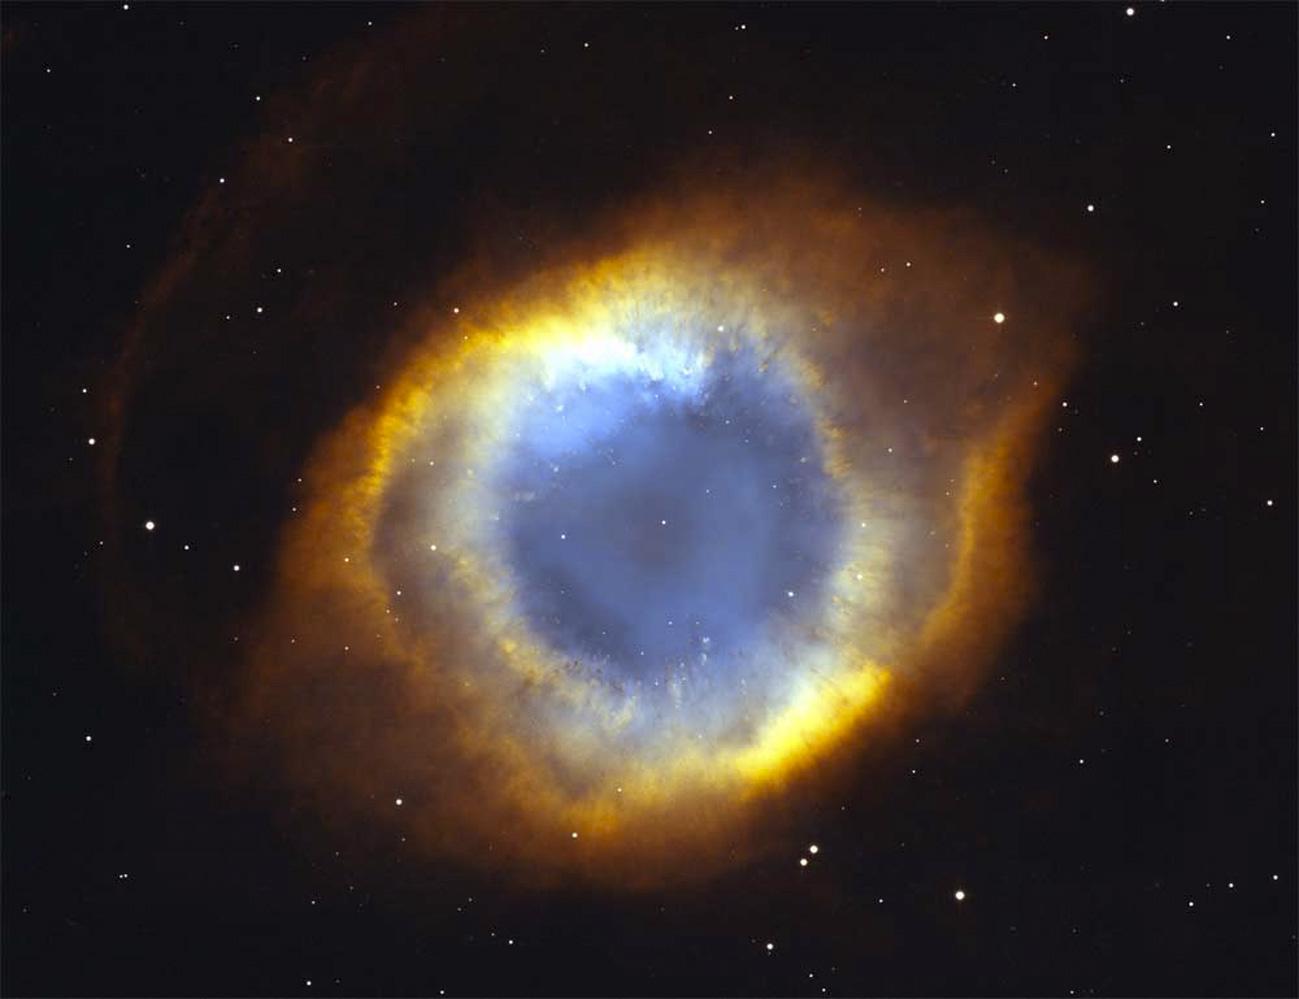 Embedding fstoppers-shanks-fx-interstellar-black-hole-helix-nebula-eye-of-god-aaron-brown.jpg